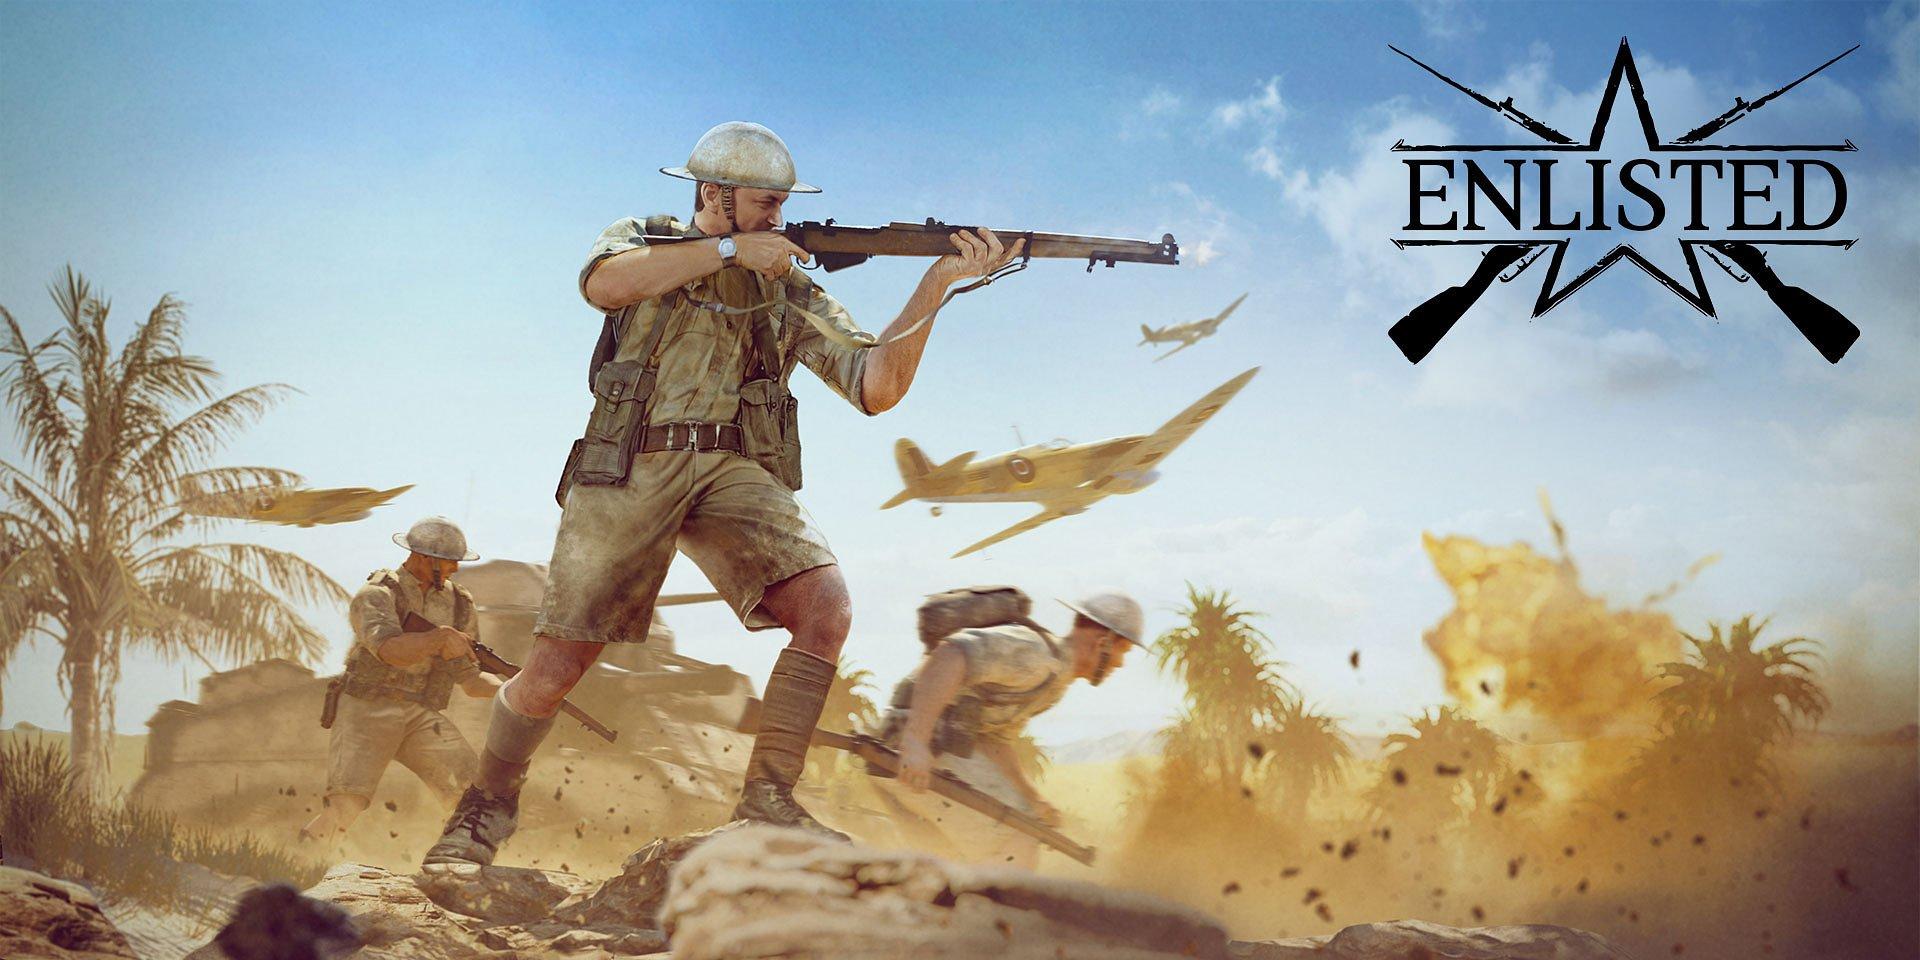 Bitka o Tunisko, kampaň uzavretého beta testovania štartuje v hre Enlisted